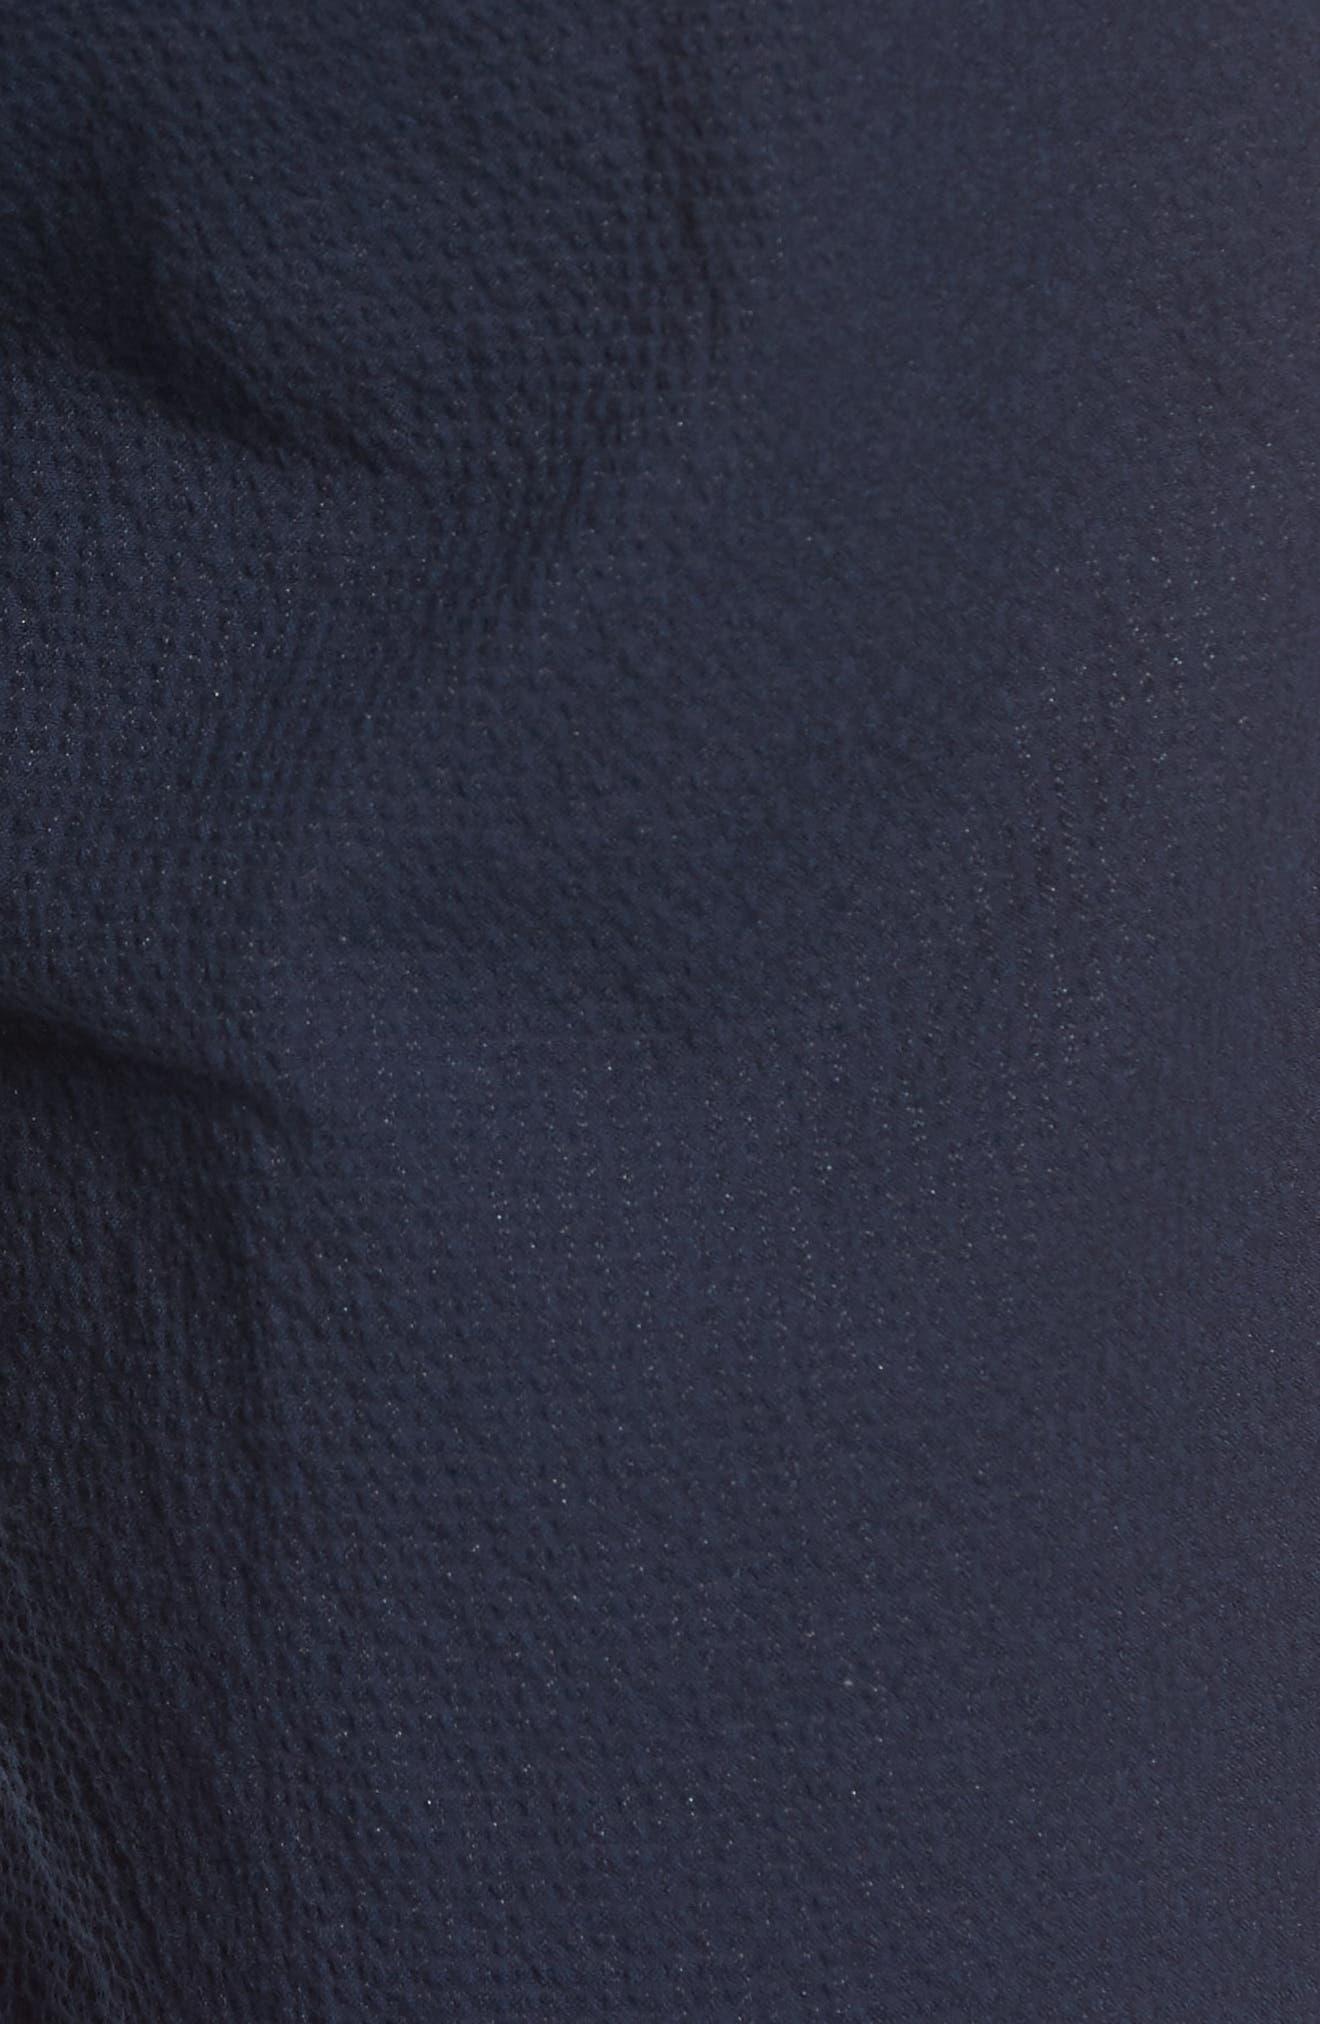 Costa Cotton Blend Shorts,                             Alternate thumbnail 5, color,                             410